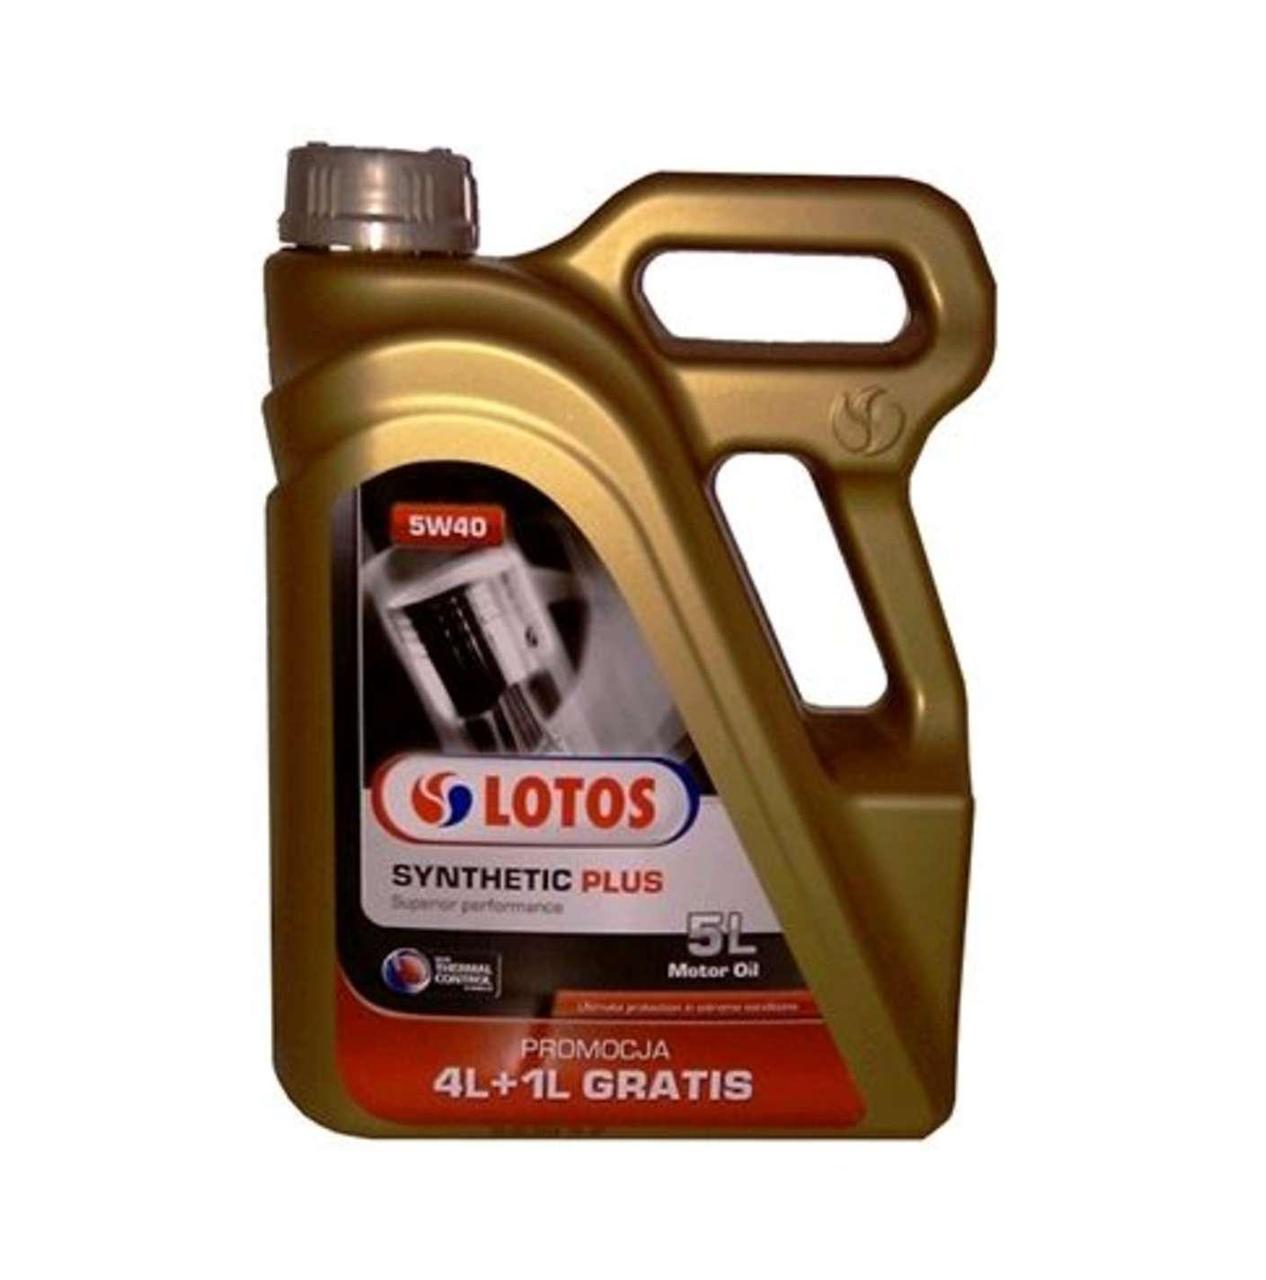 Масло автомобильное, 5л (SAE 5W-40, синтетика) (Synthetic Plus) LOTOS (#GPL)